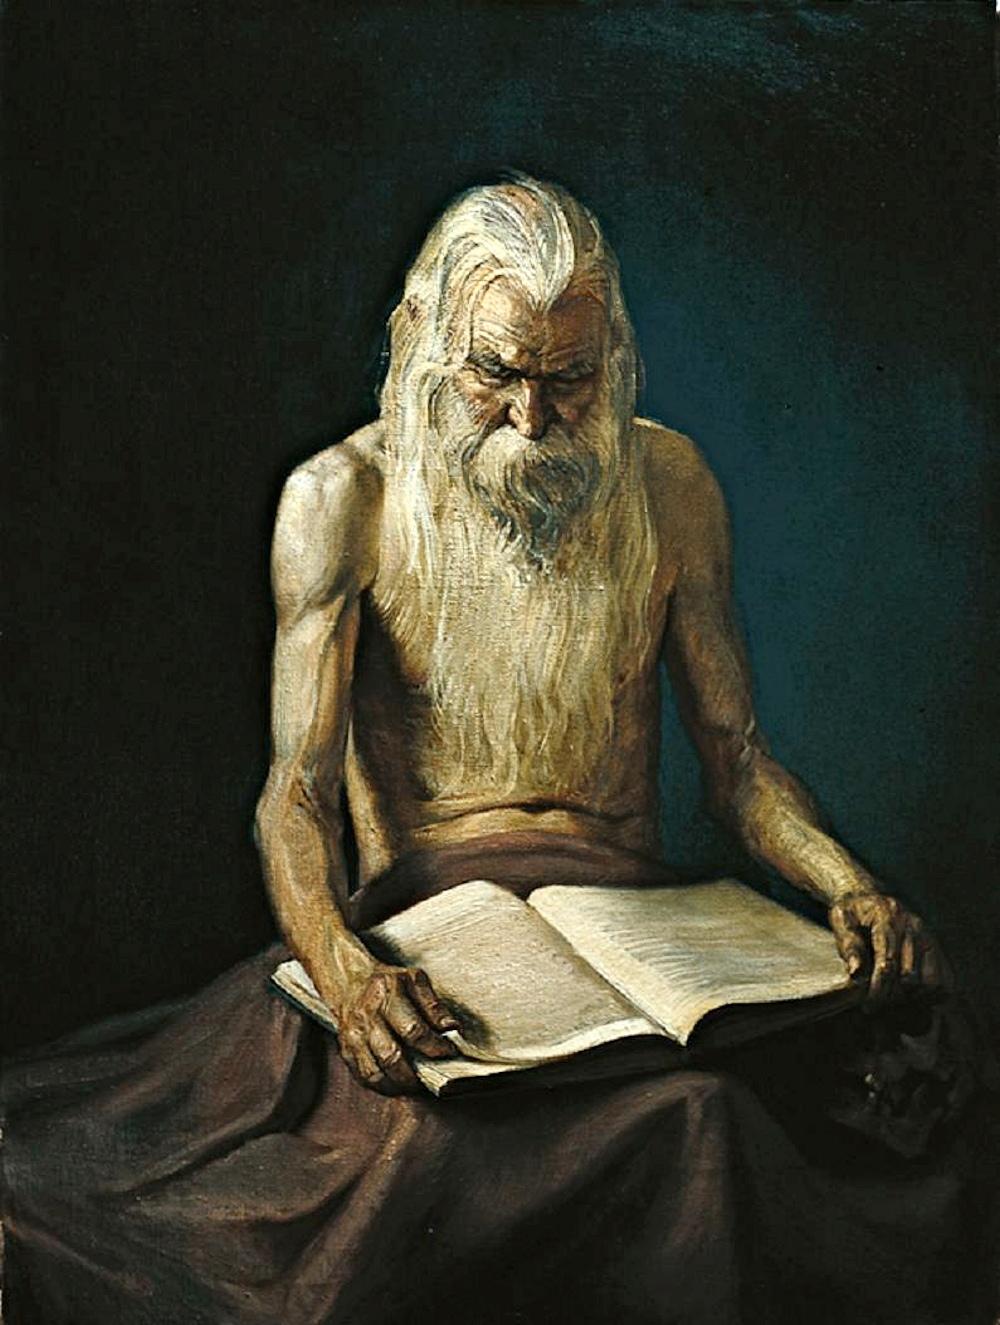 00 Mikhail Shankov. Knowledge. 1990